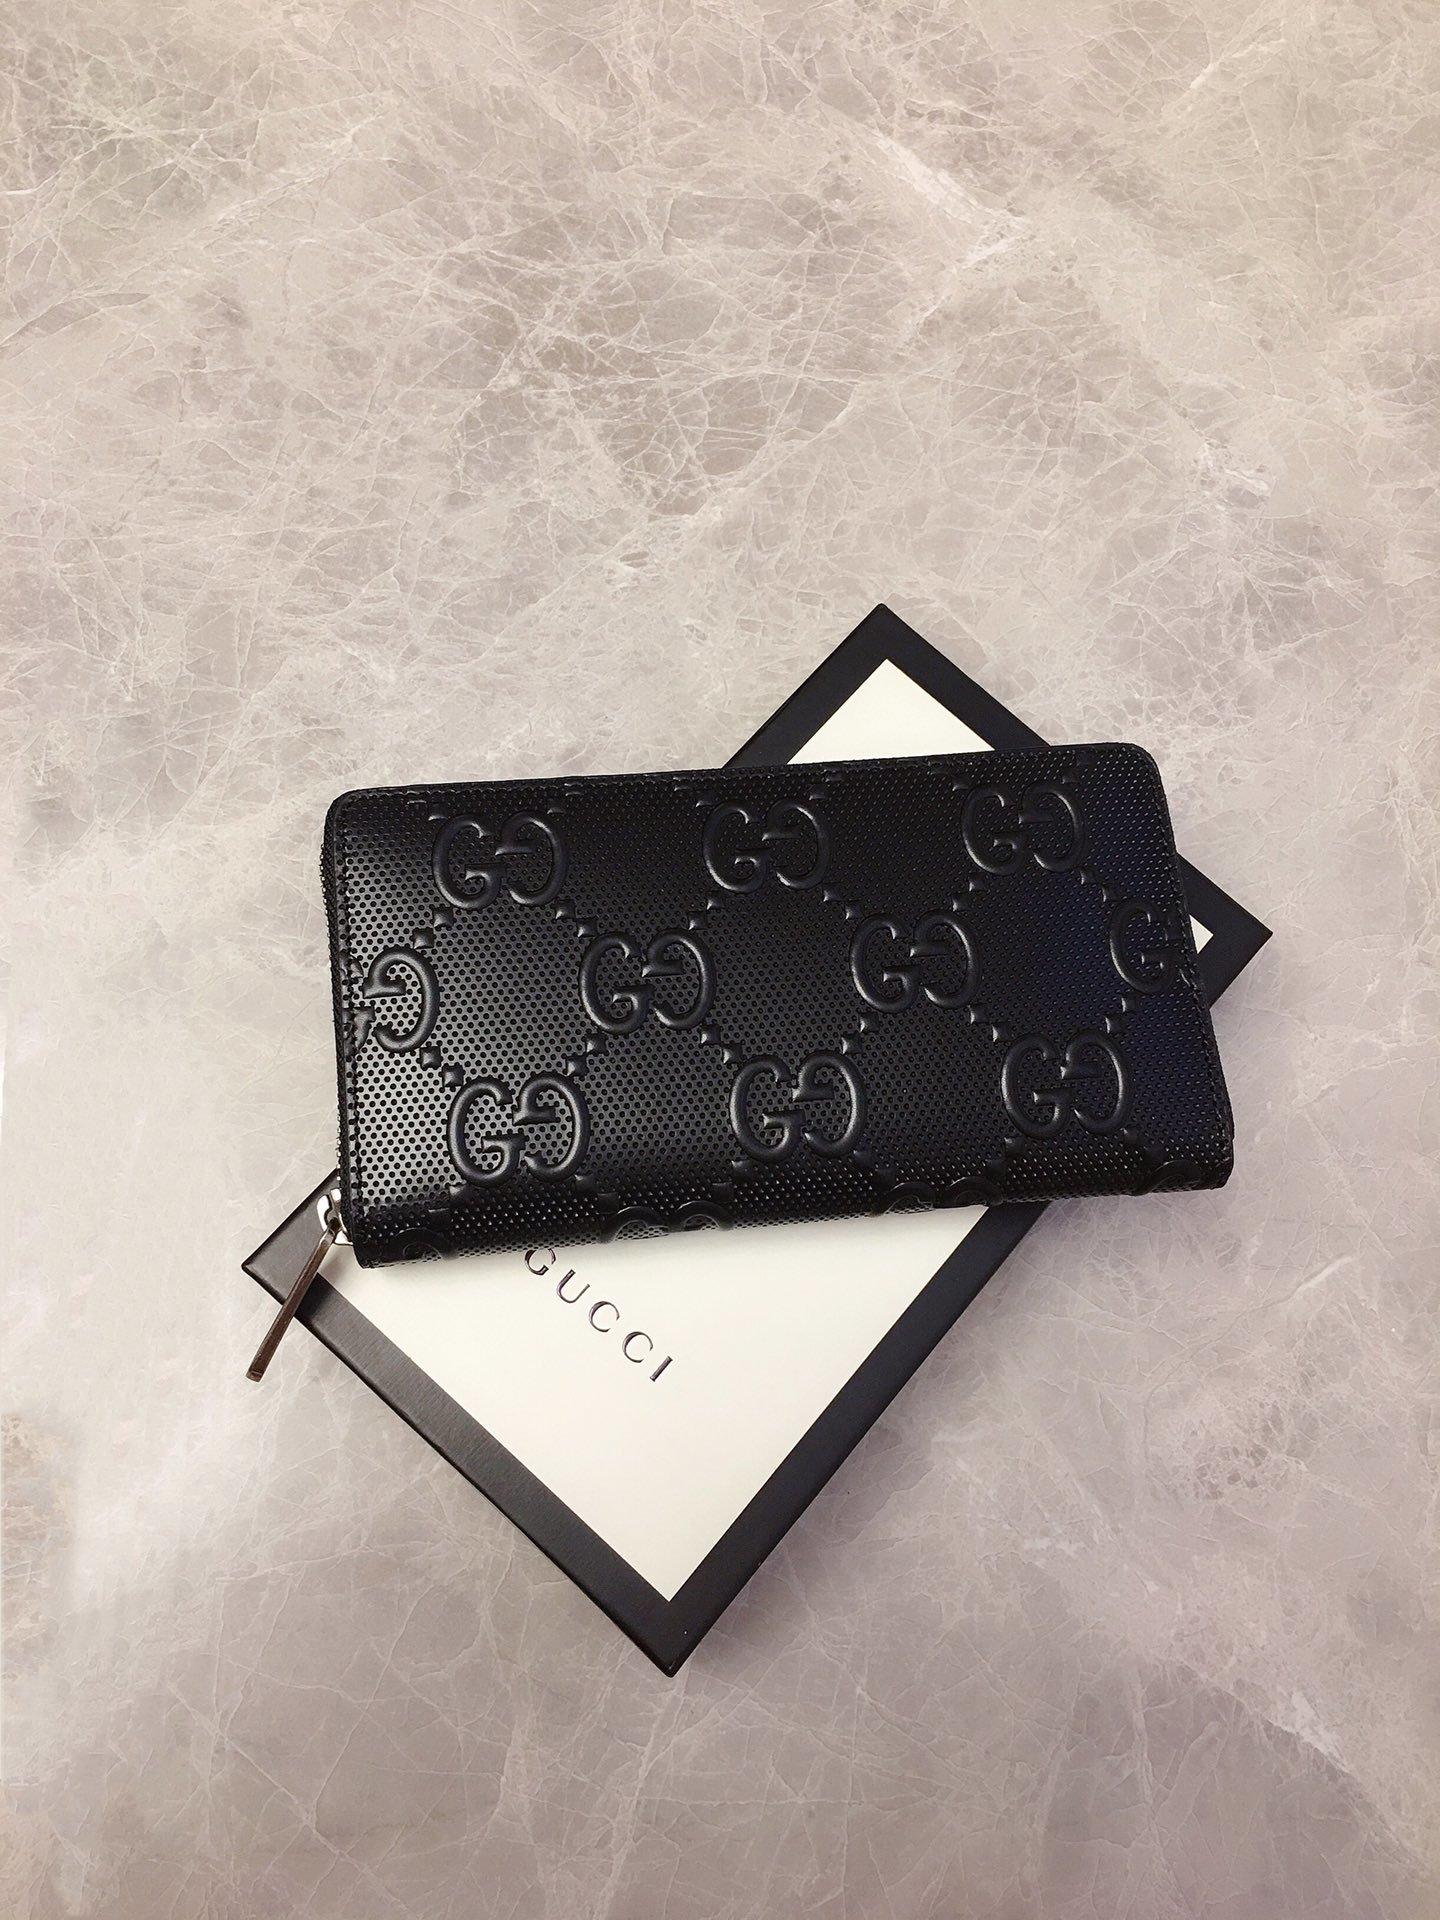 Gucci2020早秋新款钱包双G压花(图3)